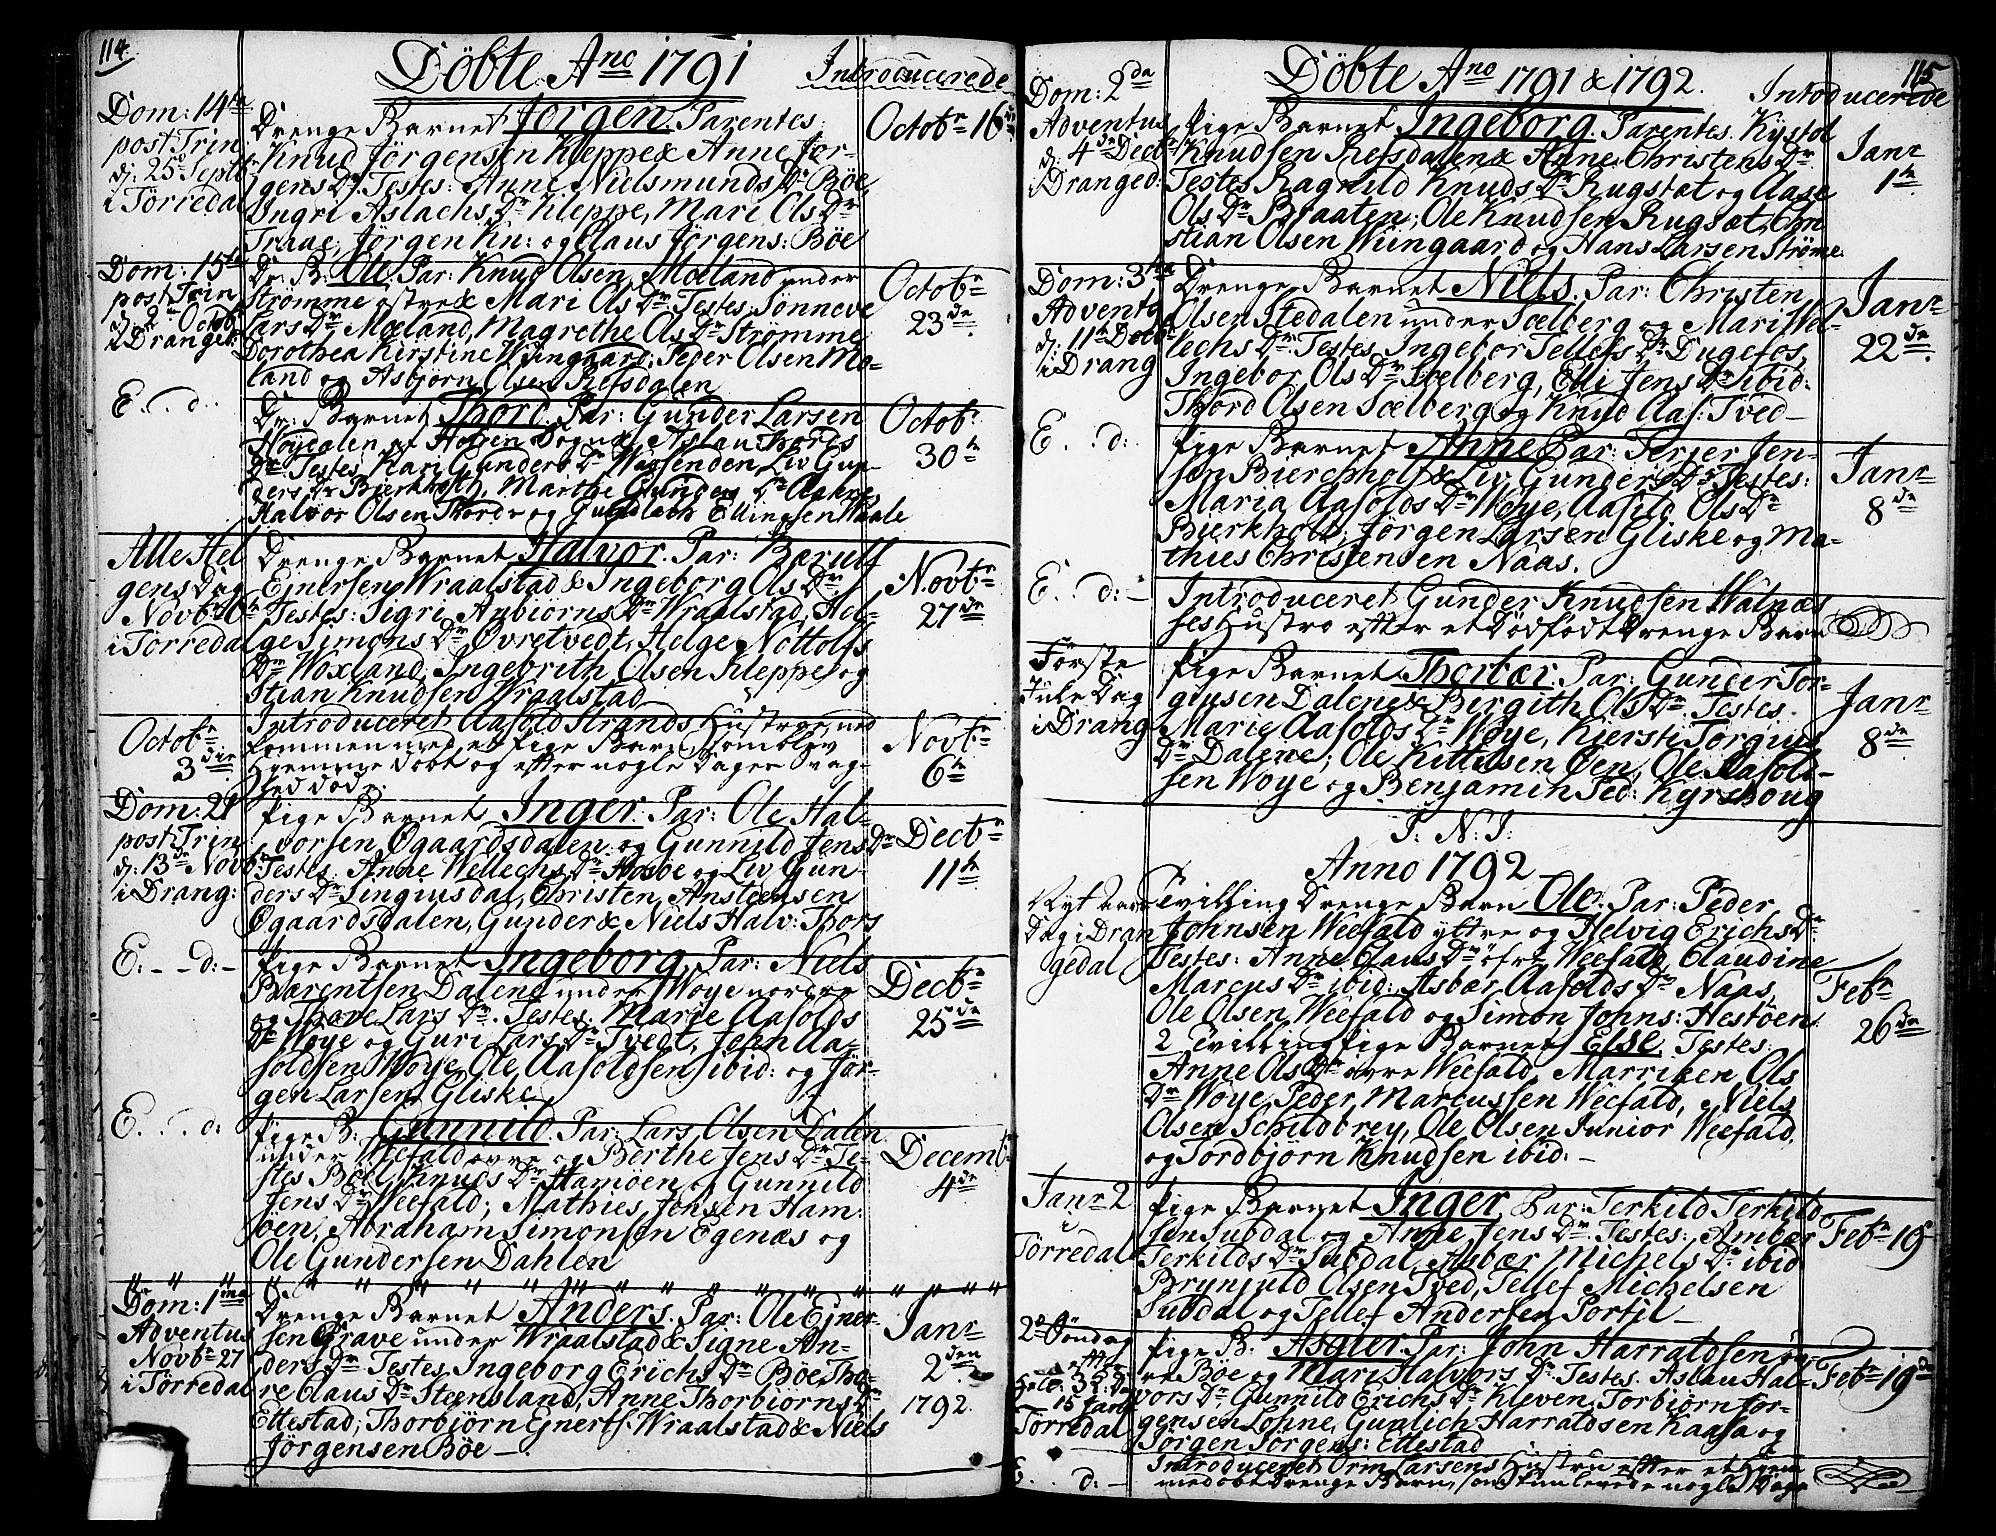 SAKO, Drangedal kirkebøker, F/Fa/L0003: Ministerialbok nr. 3, 1768-1814, s. 114-115